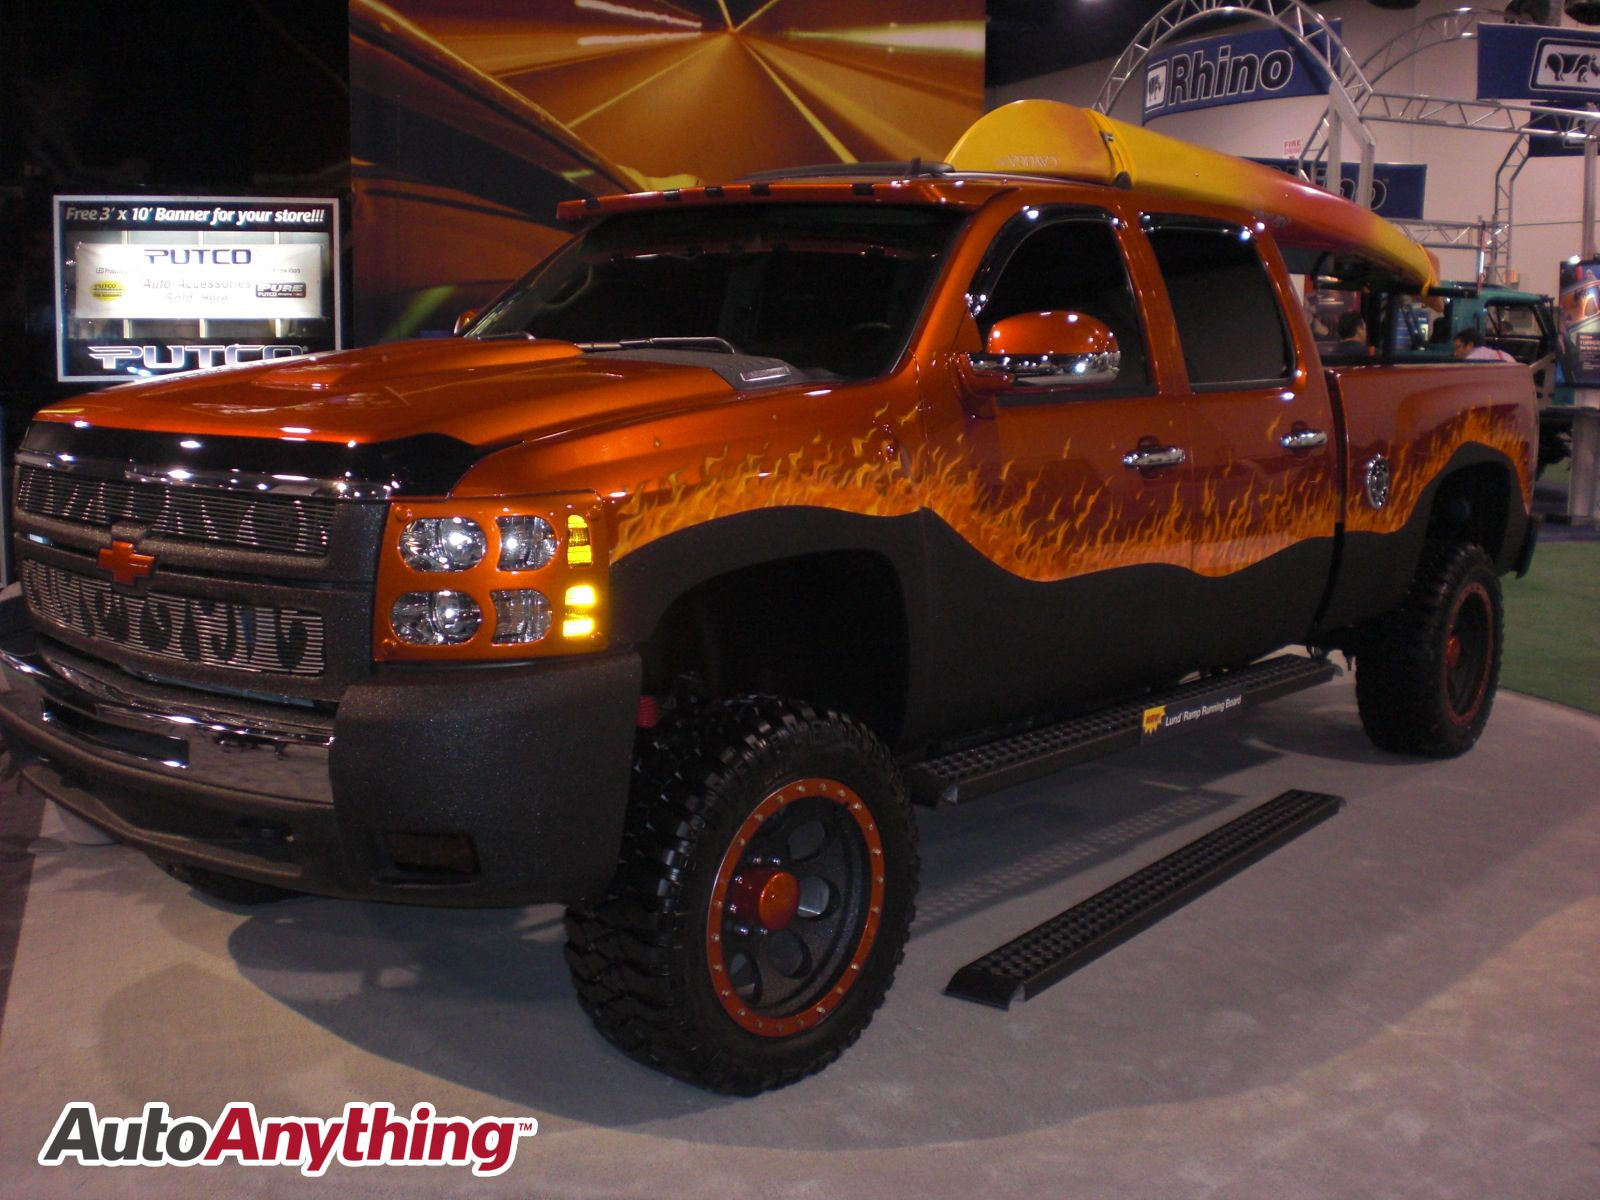 Chevy Silverado Flame Paint Job SEMA 2008 Truck paint